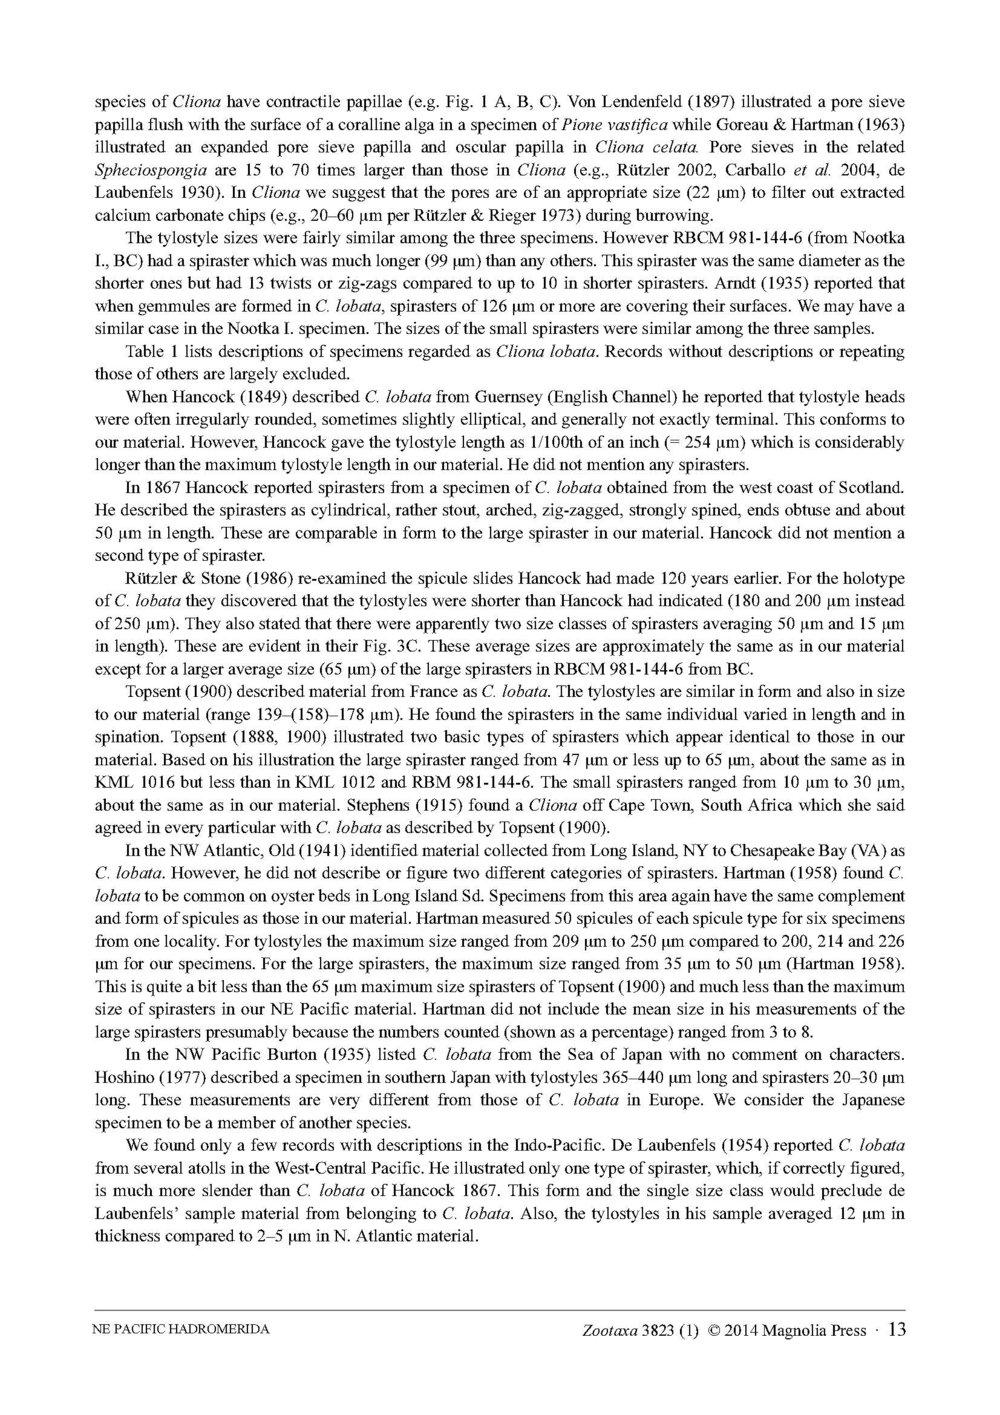 Austin et al 2014 NE Pacific Hadromerids_Page_13.jpg